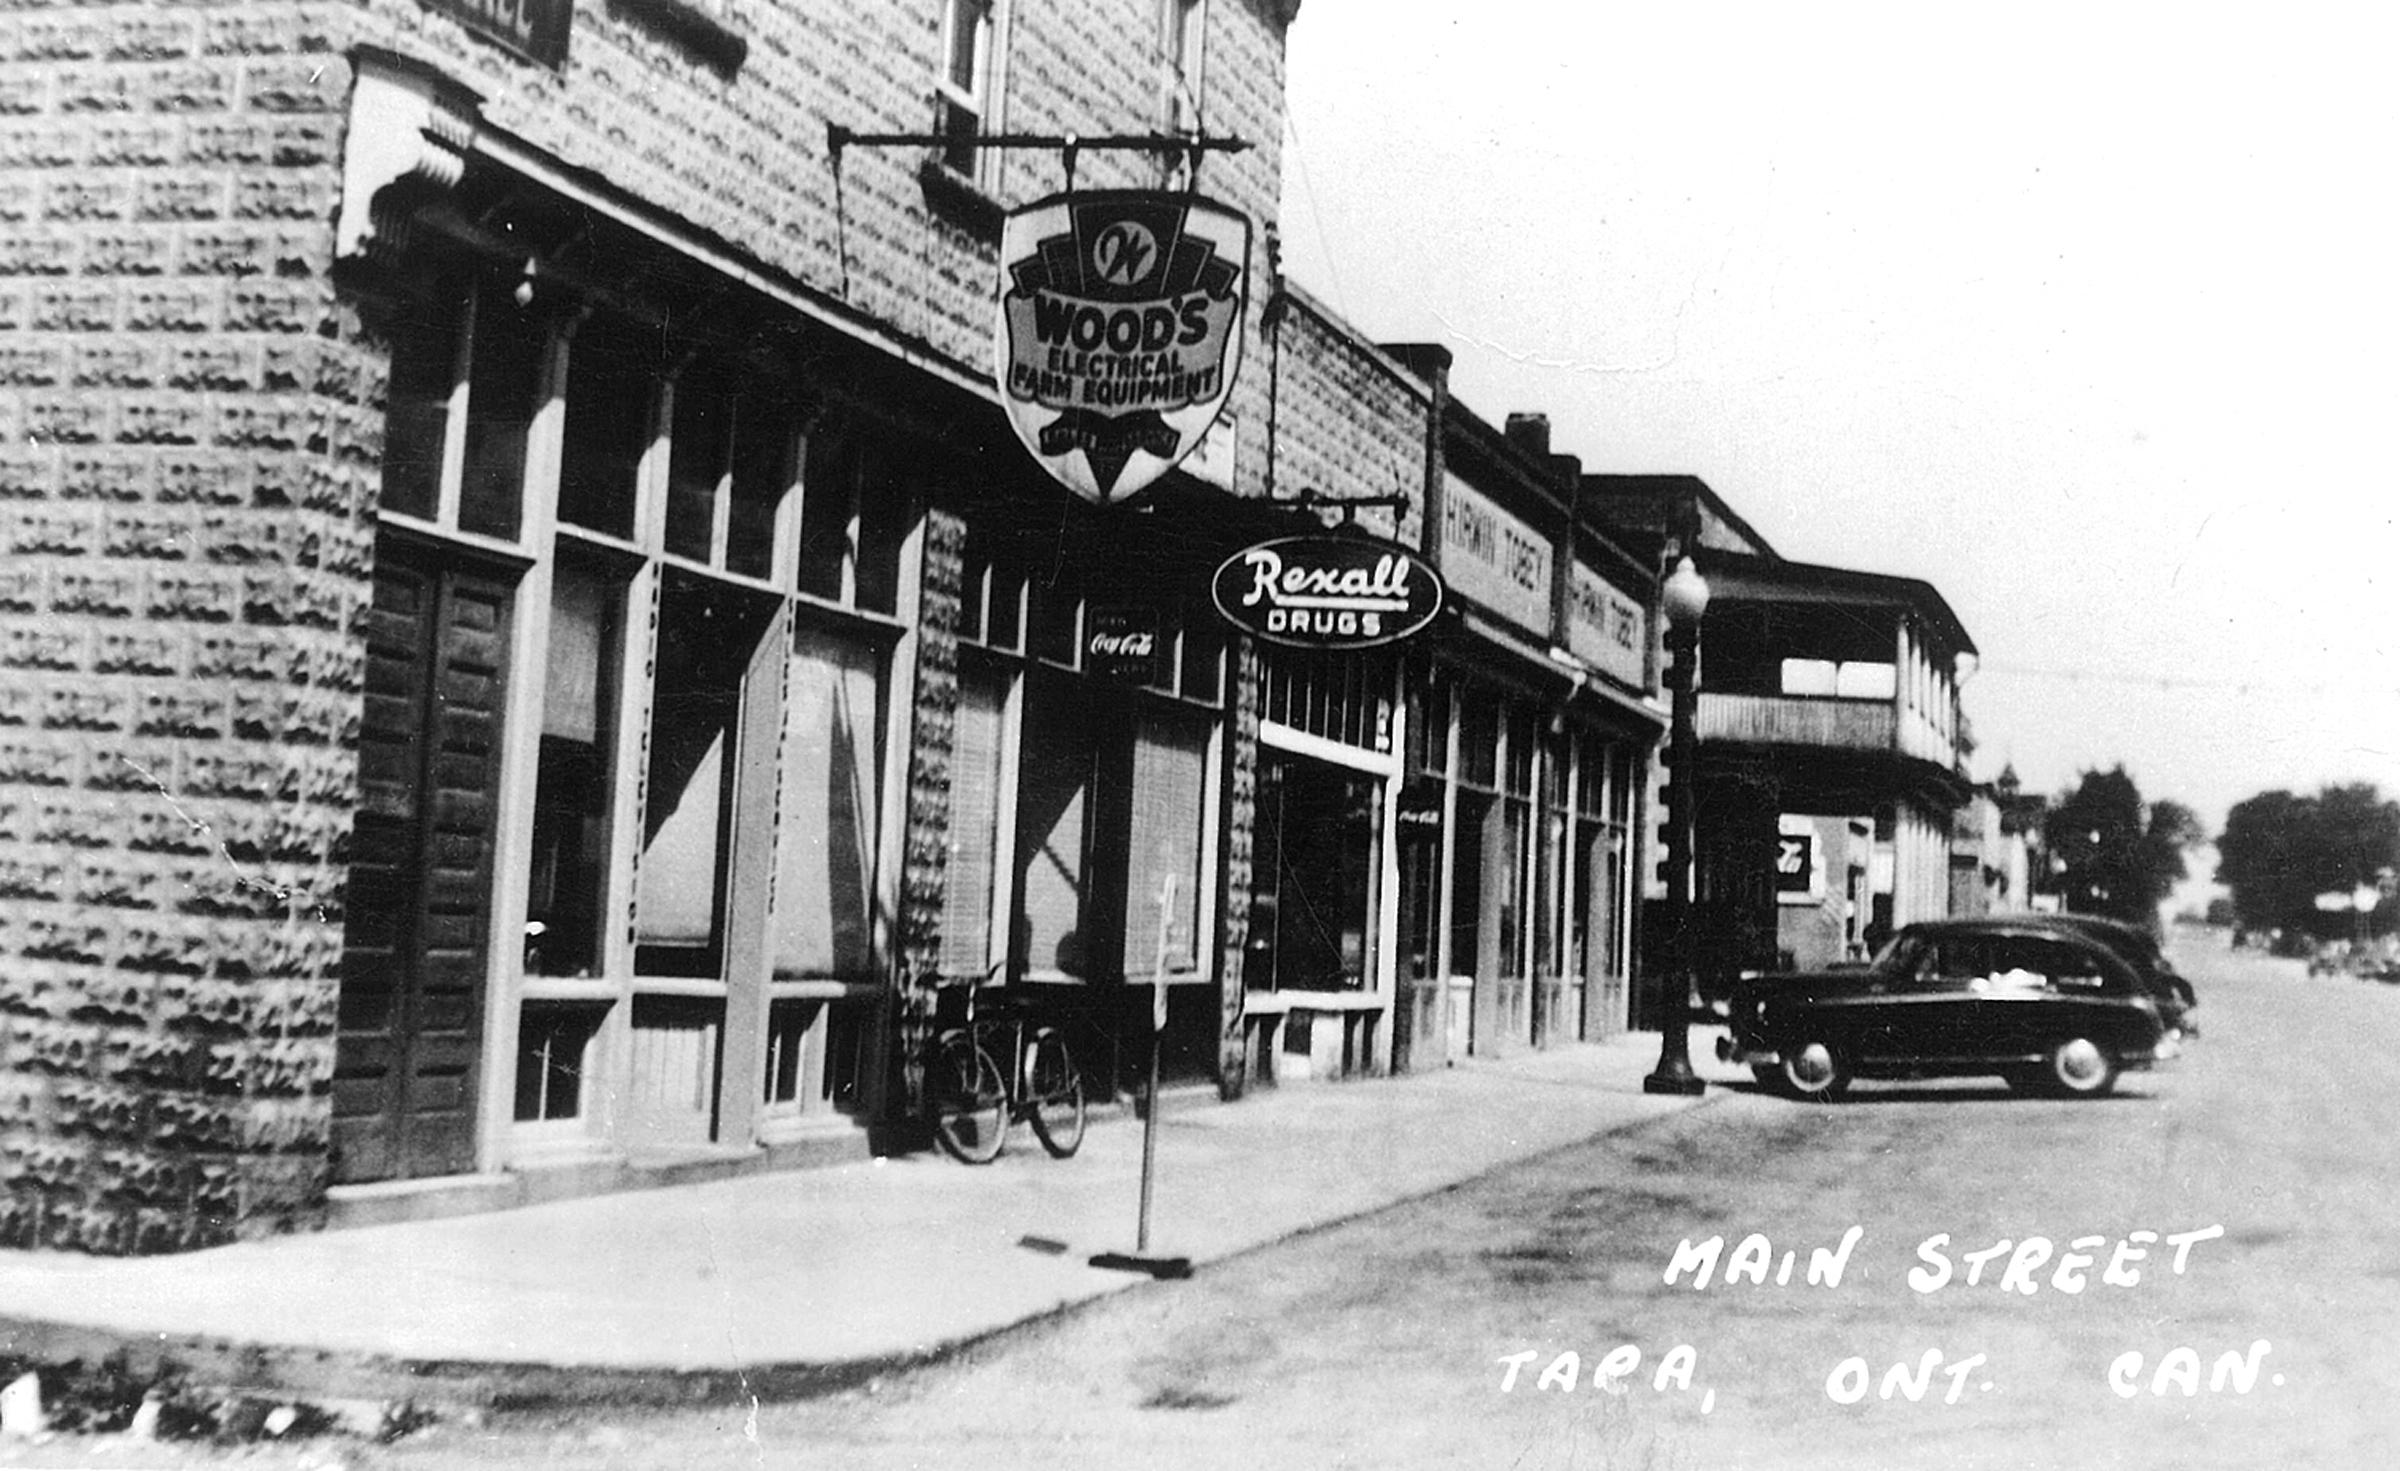 Postcard photo of Main Street, Tara in the 1950s.